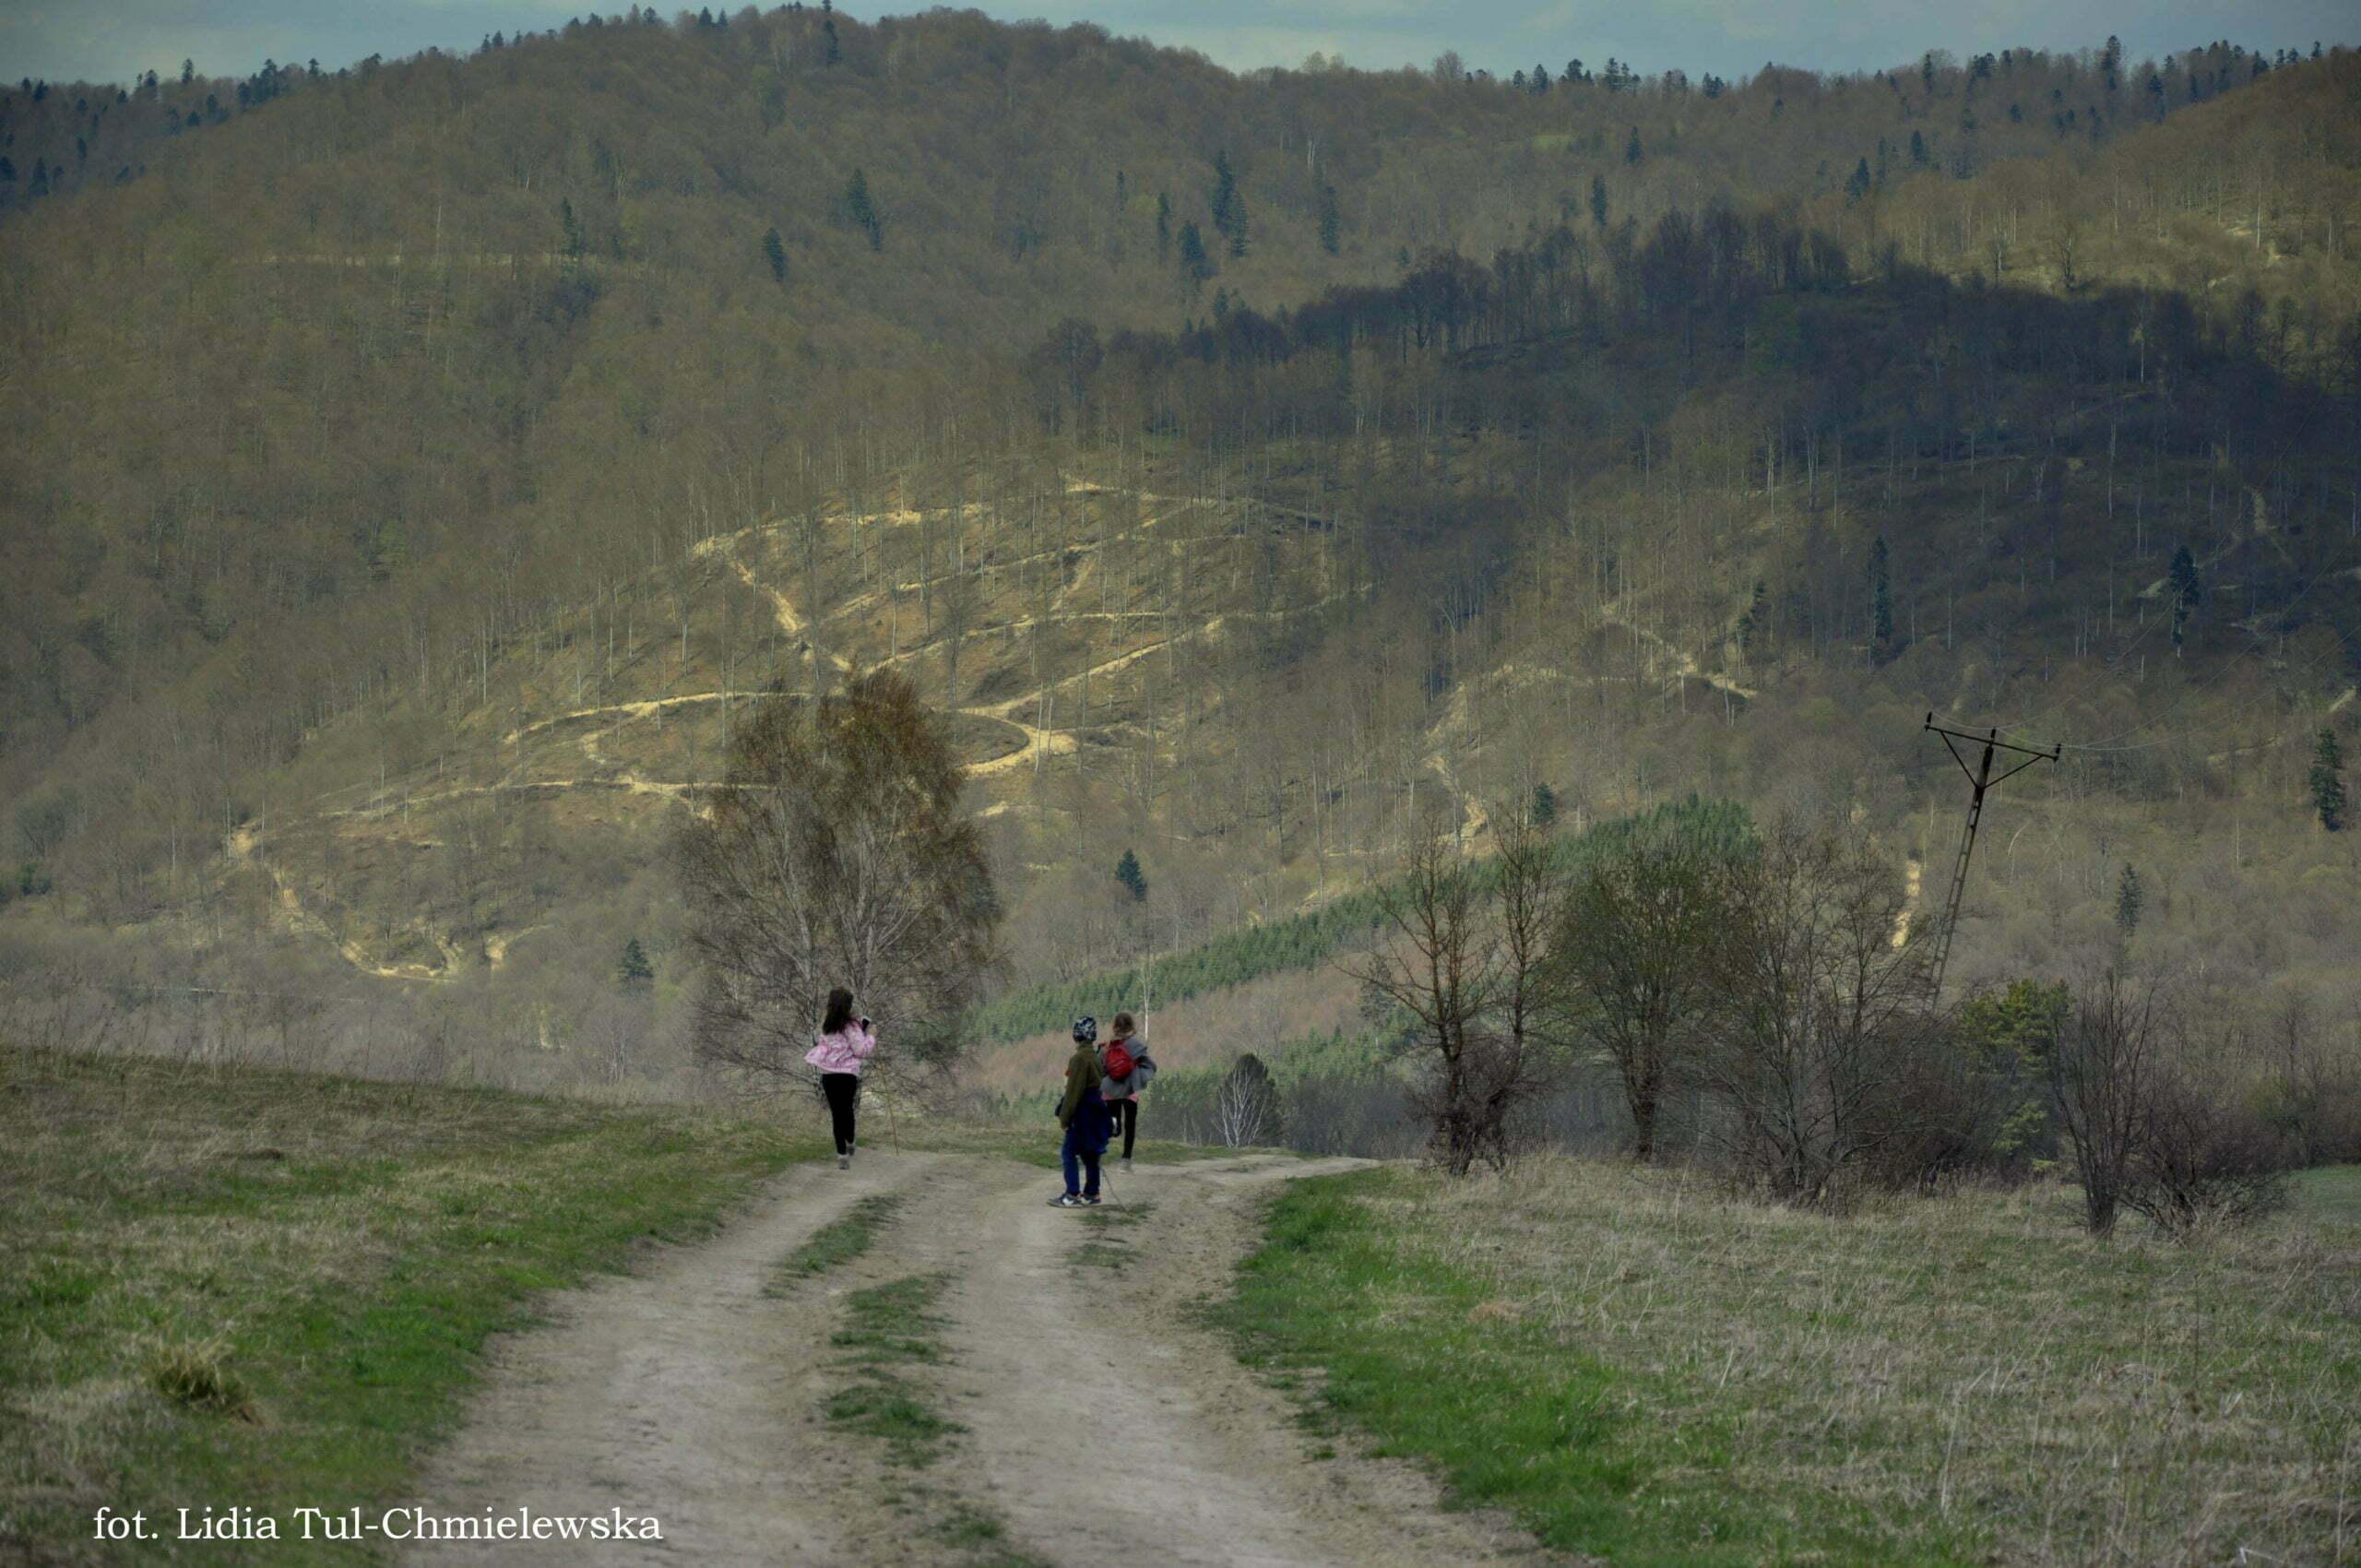 Kierunek Krywe fot. Lidia Tul-Chmielewska